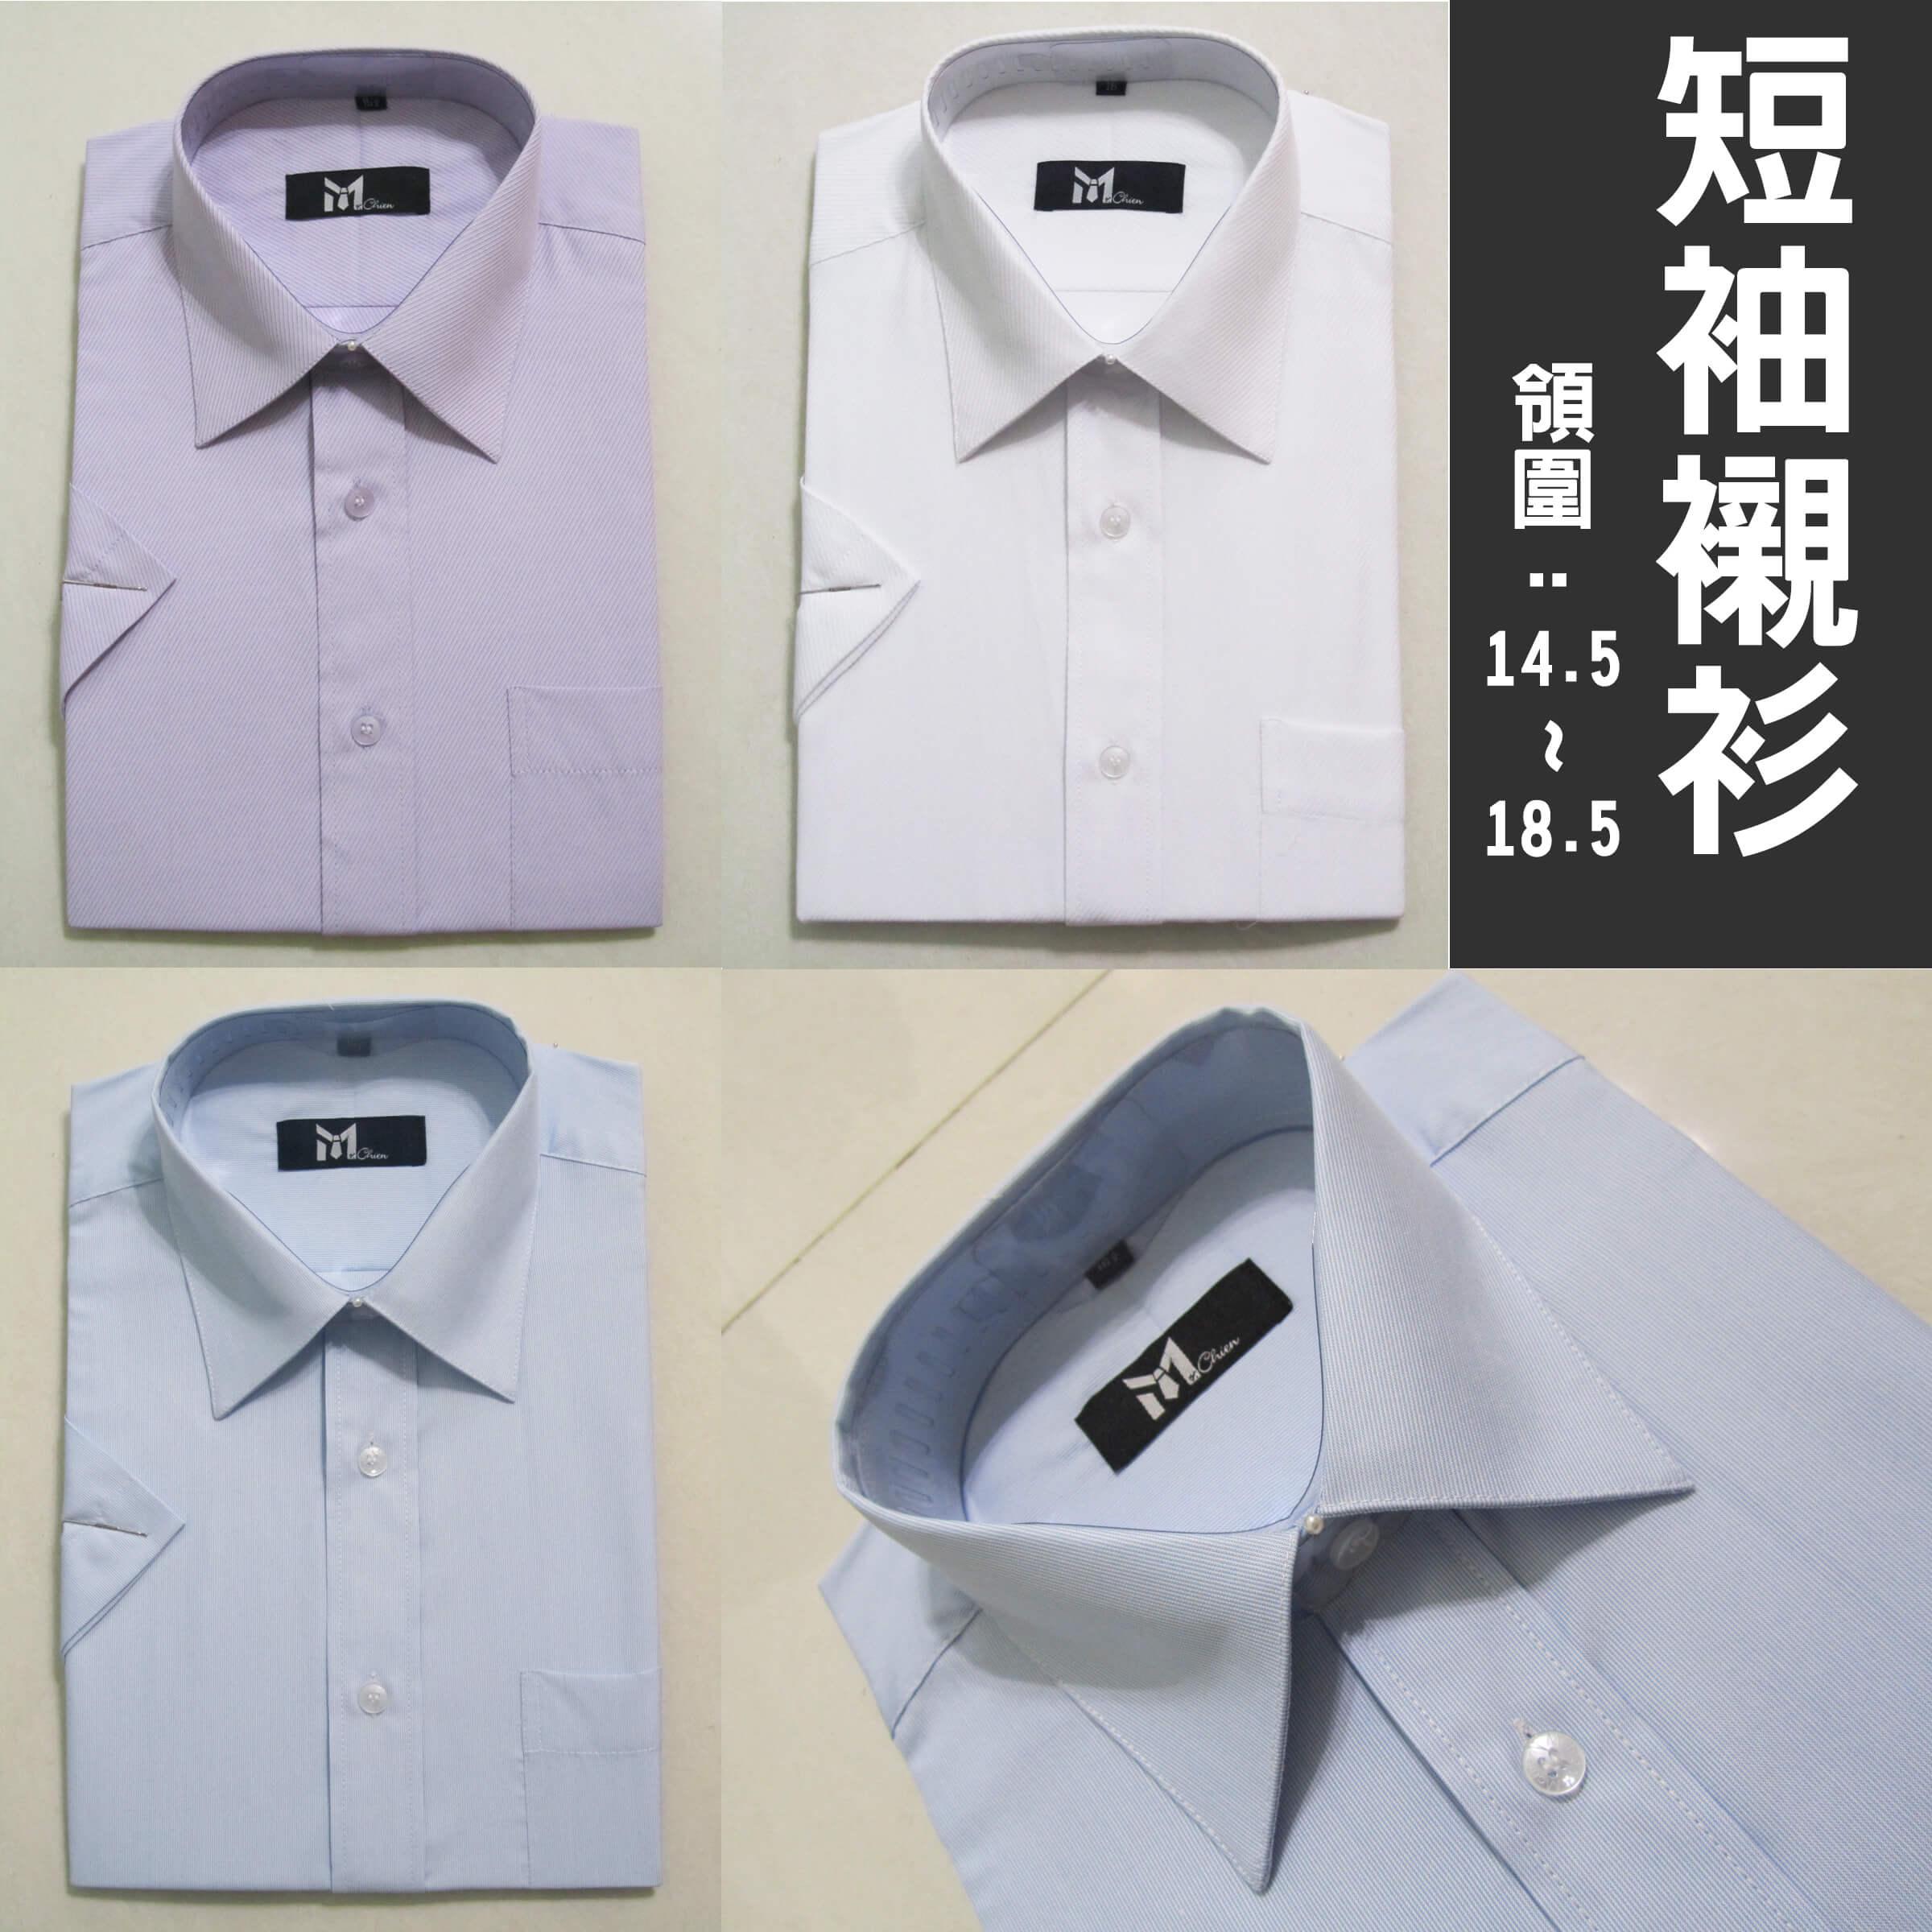 sun-e333短袖條紋襯衫、上班族襯衫、標準襯衫、商務襯衫、正式場合襯衫、柔棉舒適襯衫、不皺免燙襯衫、細條紋襯衫(333-2518-01)白色斜條紋襯衫(333-1394-23)紫色斜條紋襯衫(333-1335-09)藍色直條紋襯衫 領圍:14.5、15、15.5、16、16.5、17.5、18.5